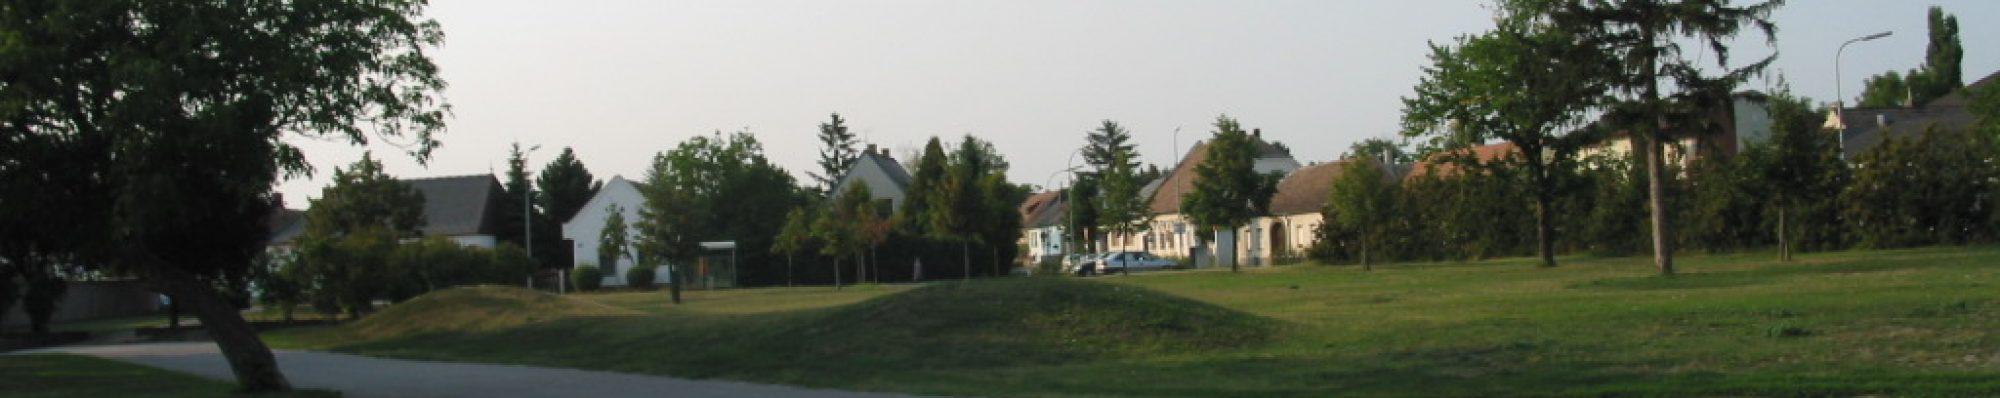 Unabhängige Dorfliste Wulkaprodersdorf